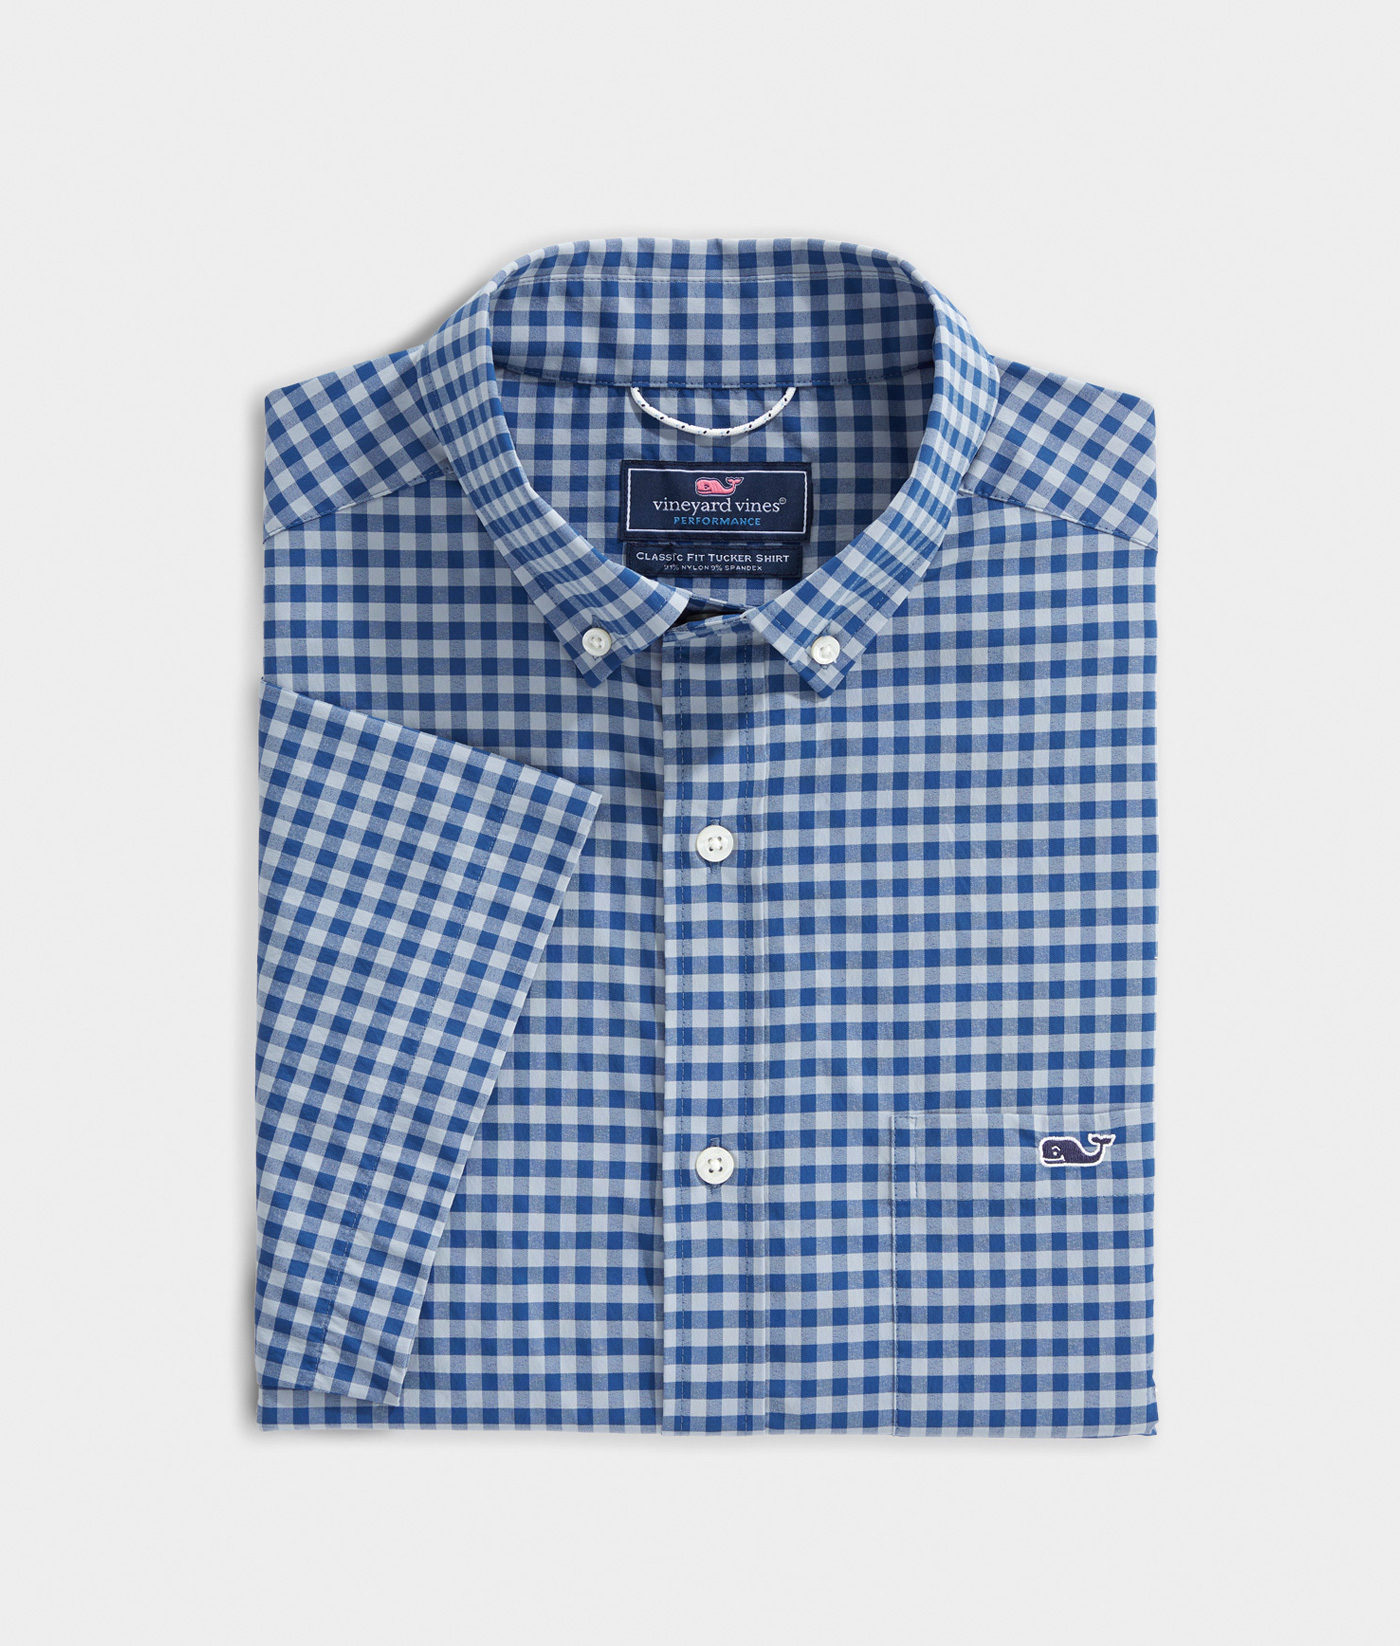 Vineyard vines Men/'s Classic Fit 5 poches toile solide Otter Pantalon Marron